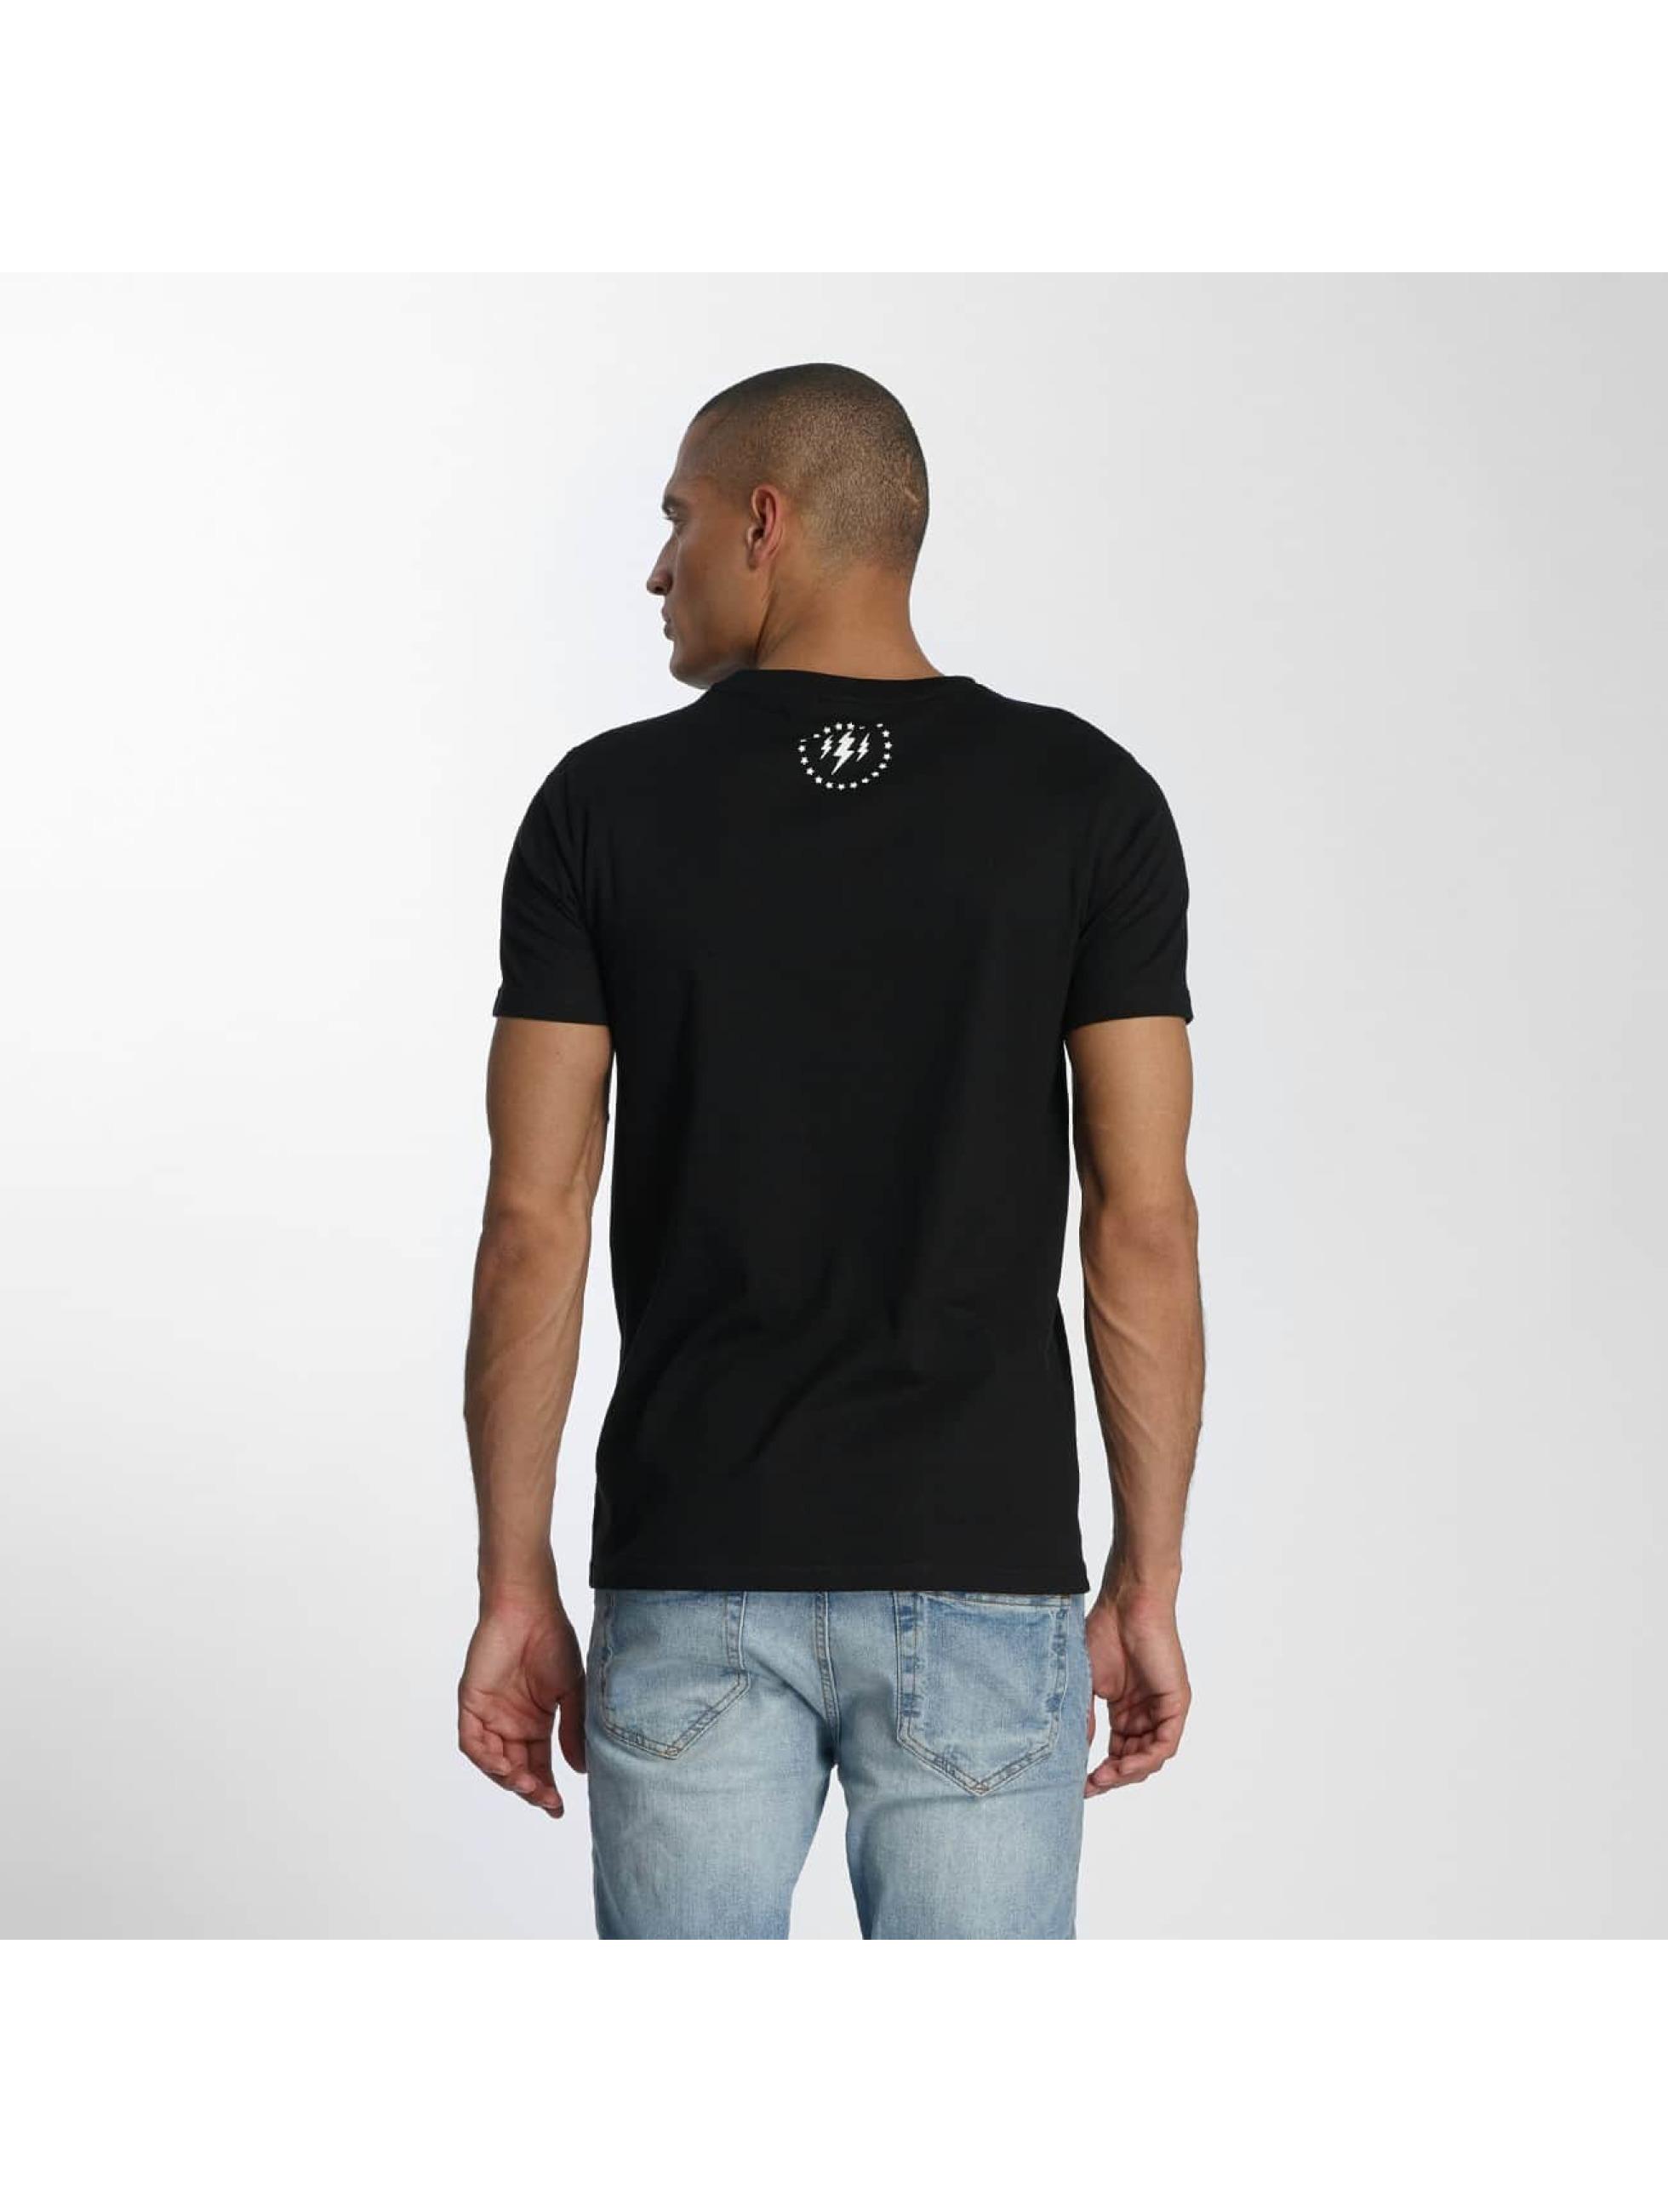 TrueSpin T-Shirt 3 schwarz